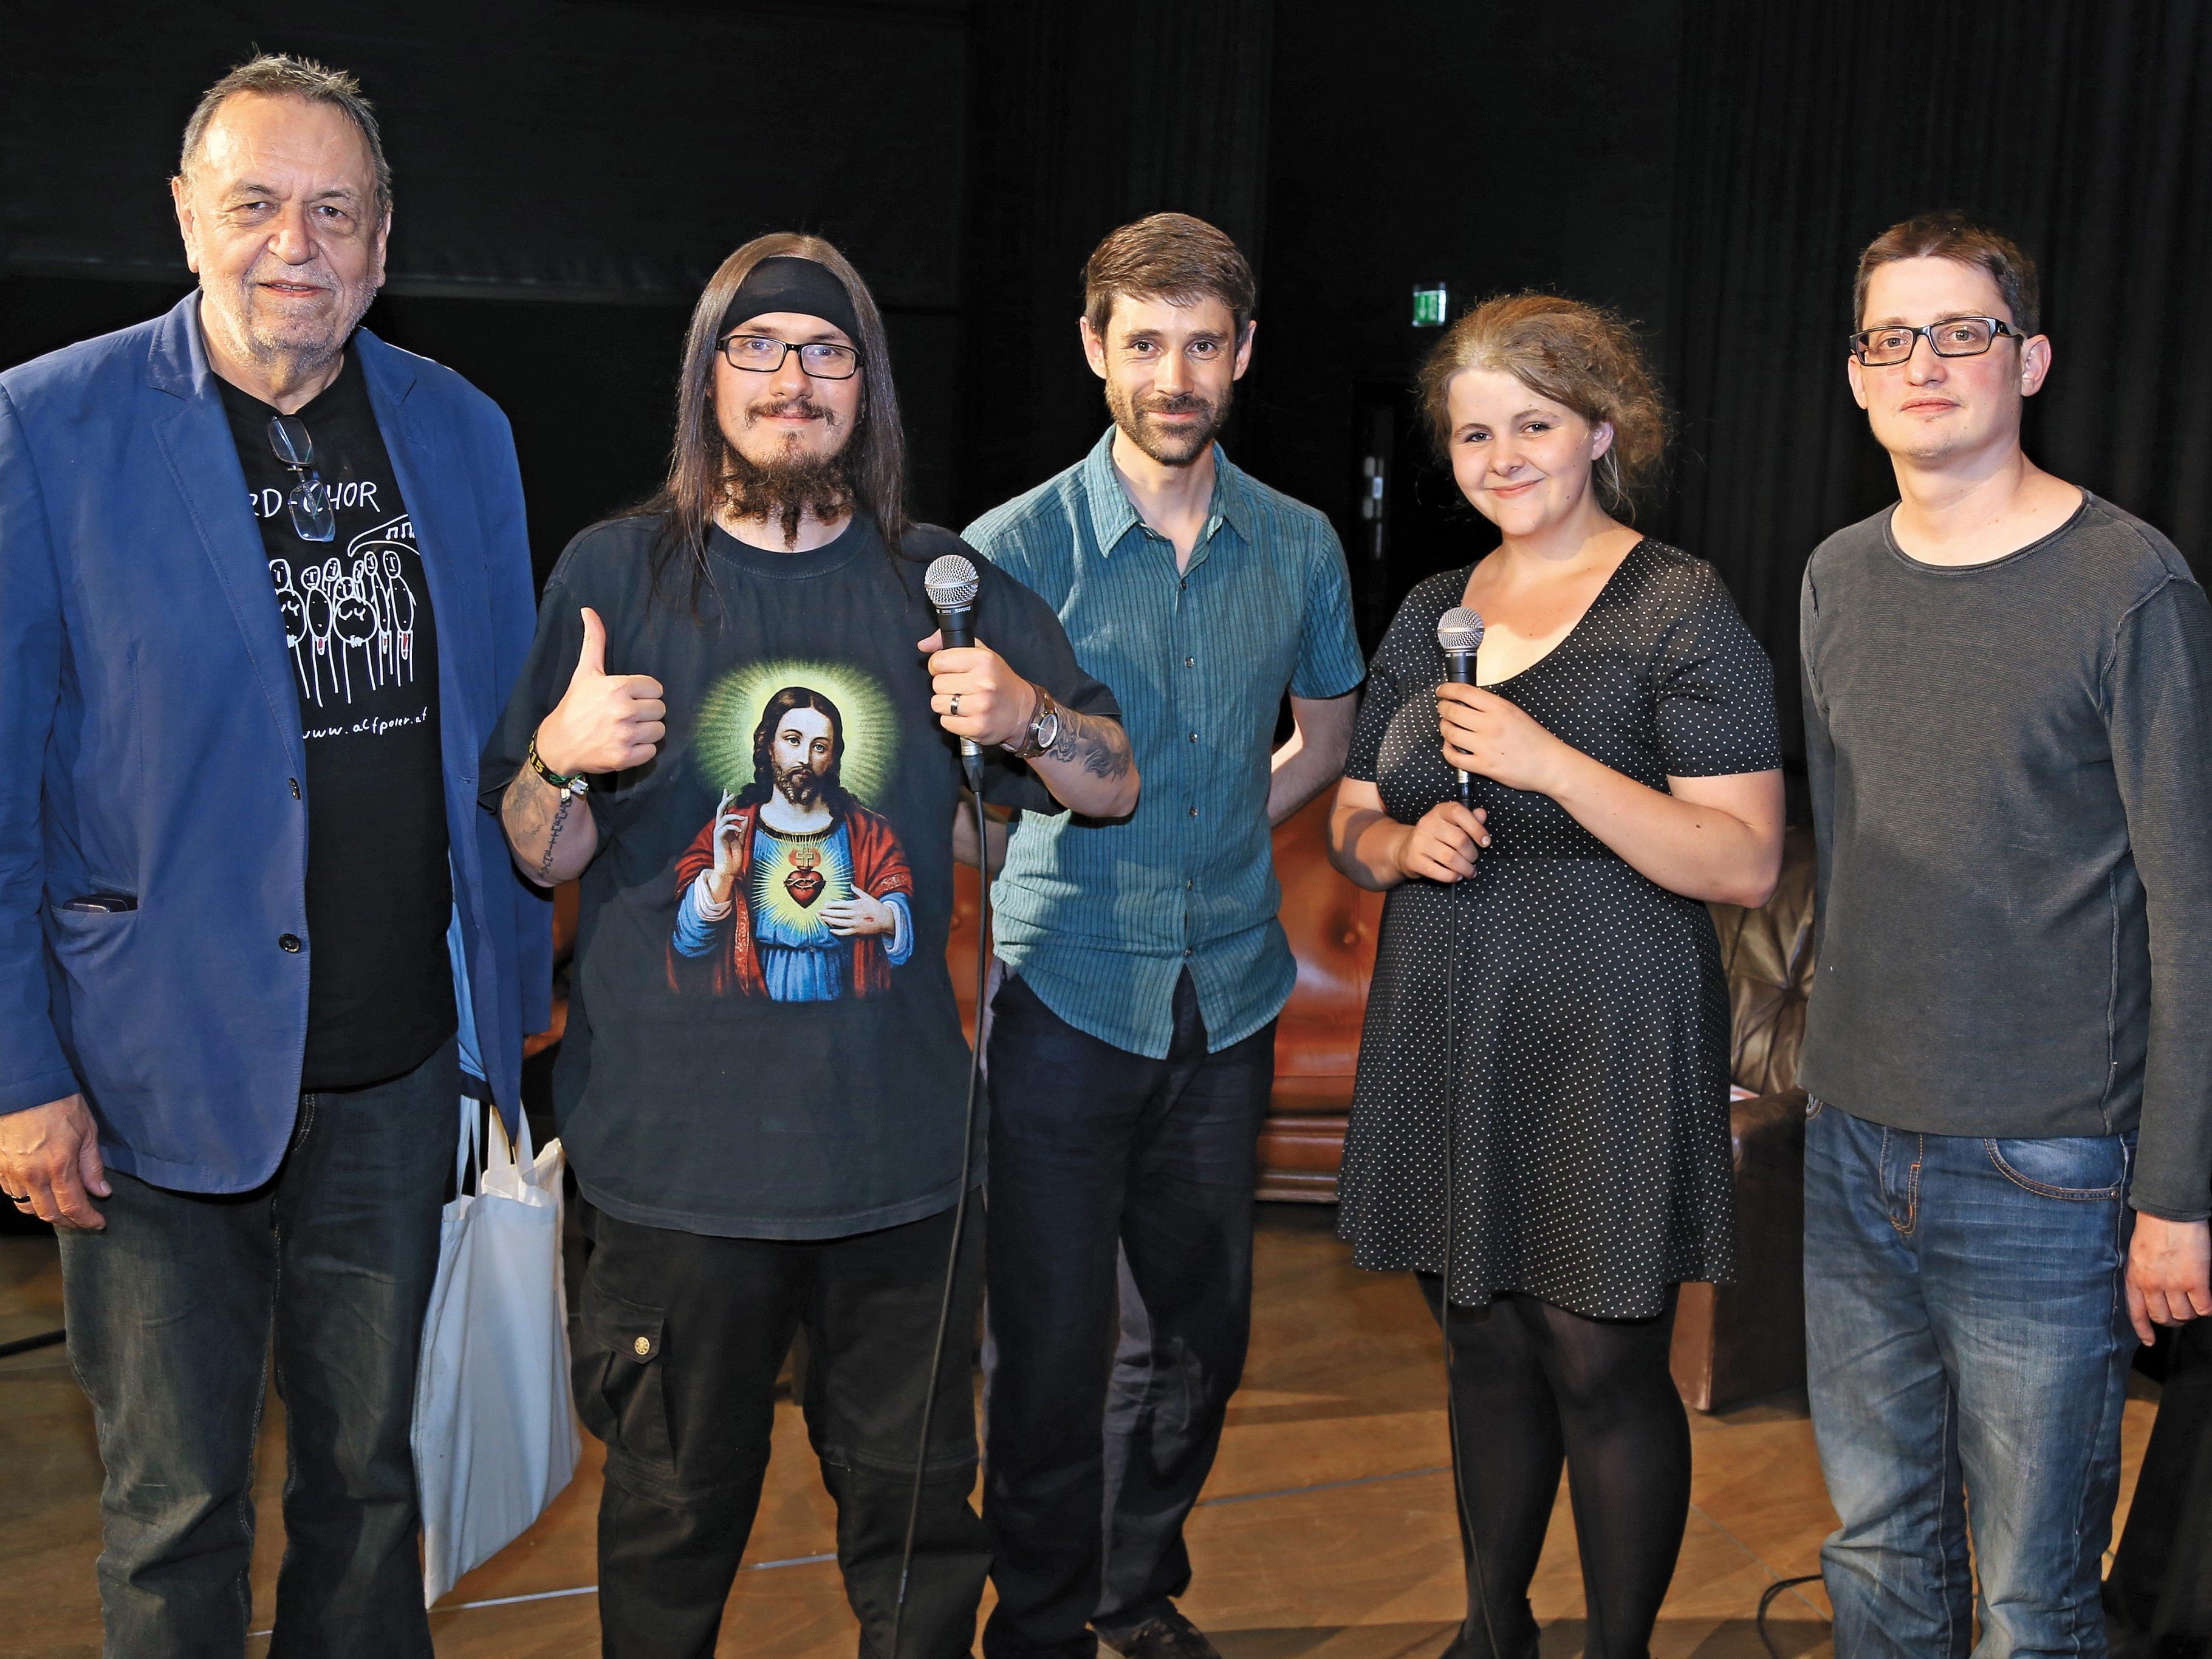 Die Poetry-Slam-Künstler: Ulrich Gabriel, J-Man, Moderator Tom Astleitner, Teresia Gröchenig und Peter Frick (v. l.).